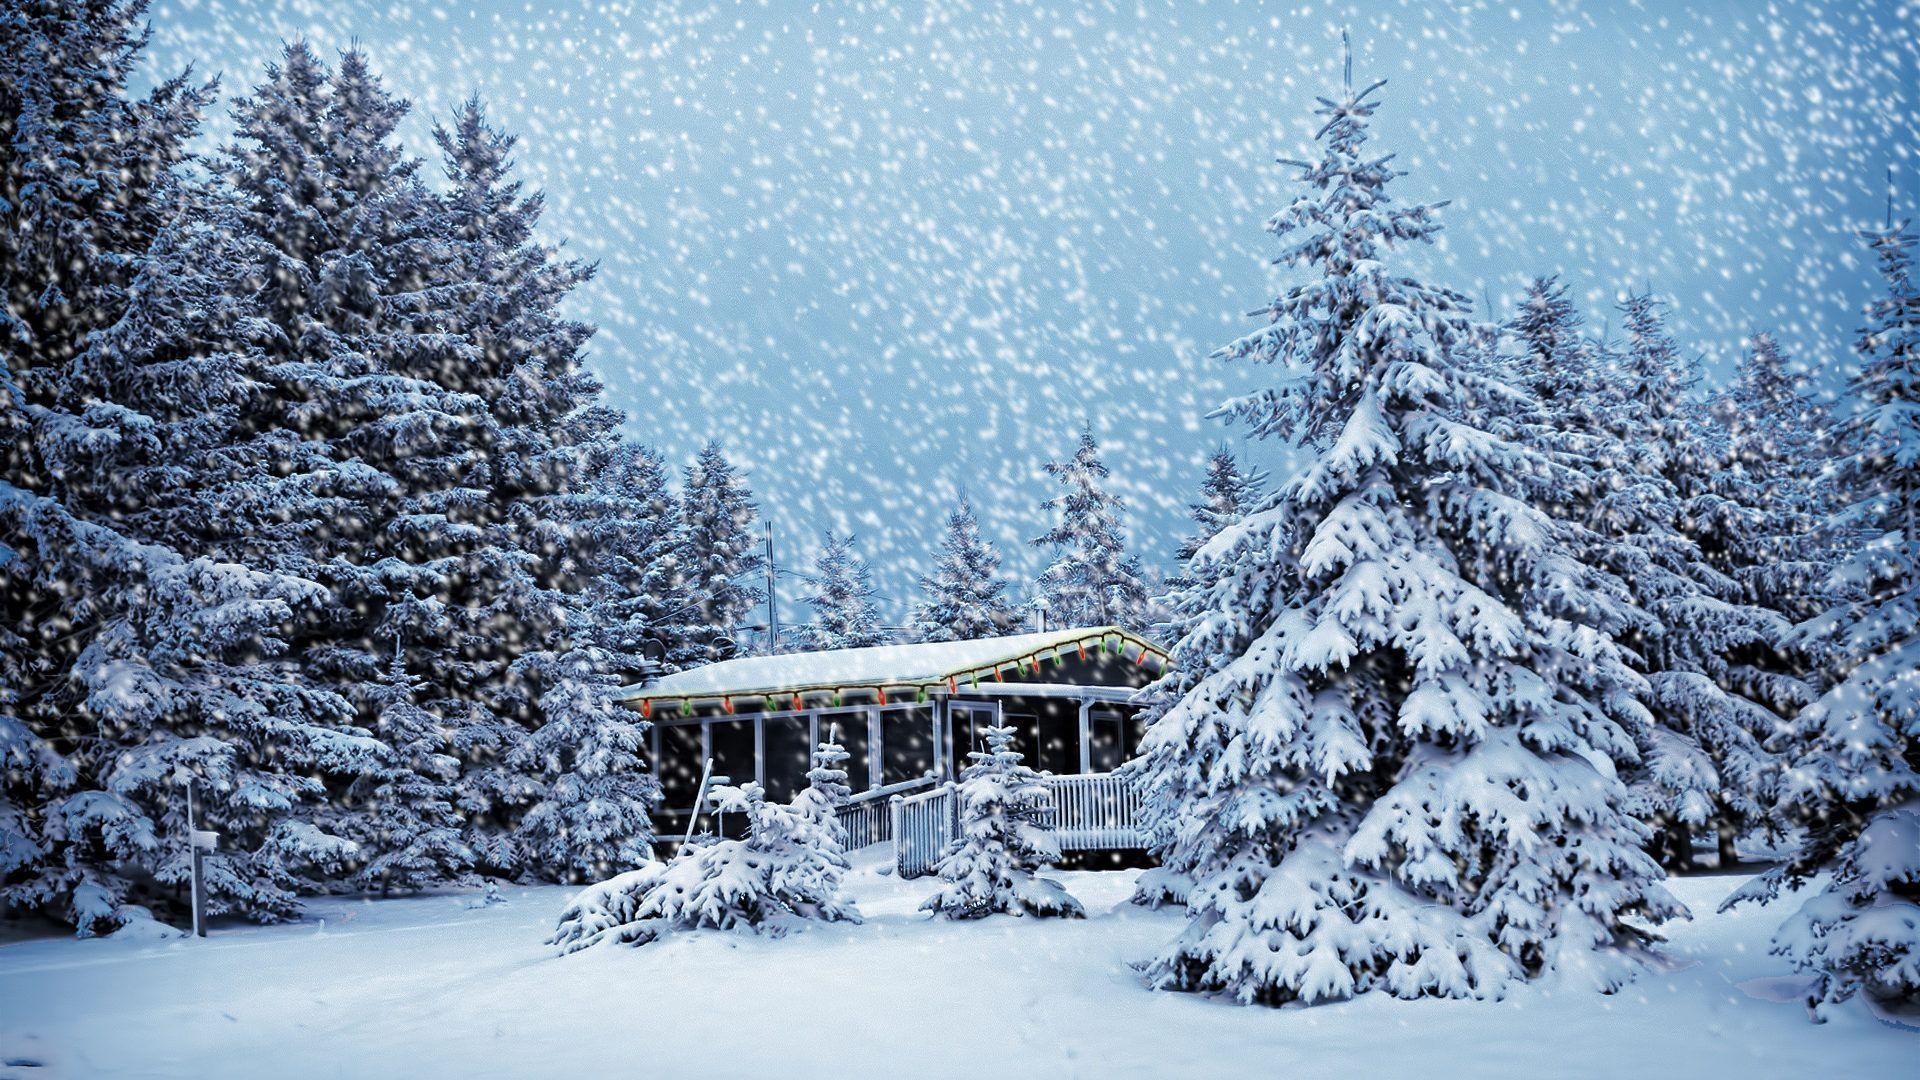 Christmas Snow Scenes   Wallpapers Web